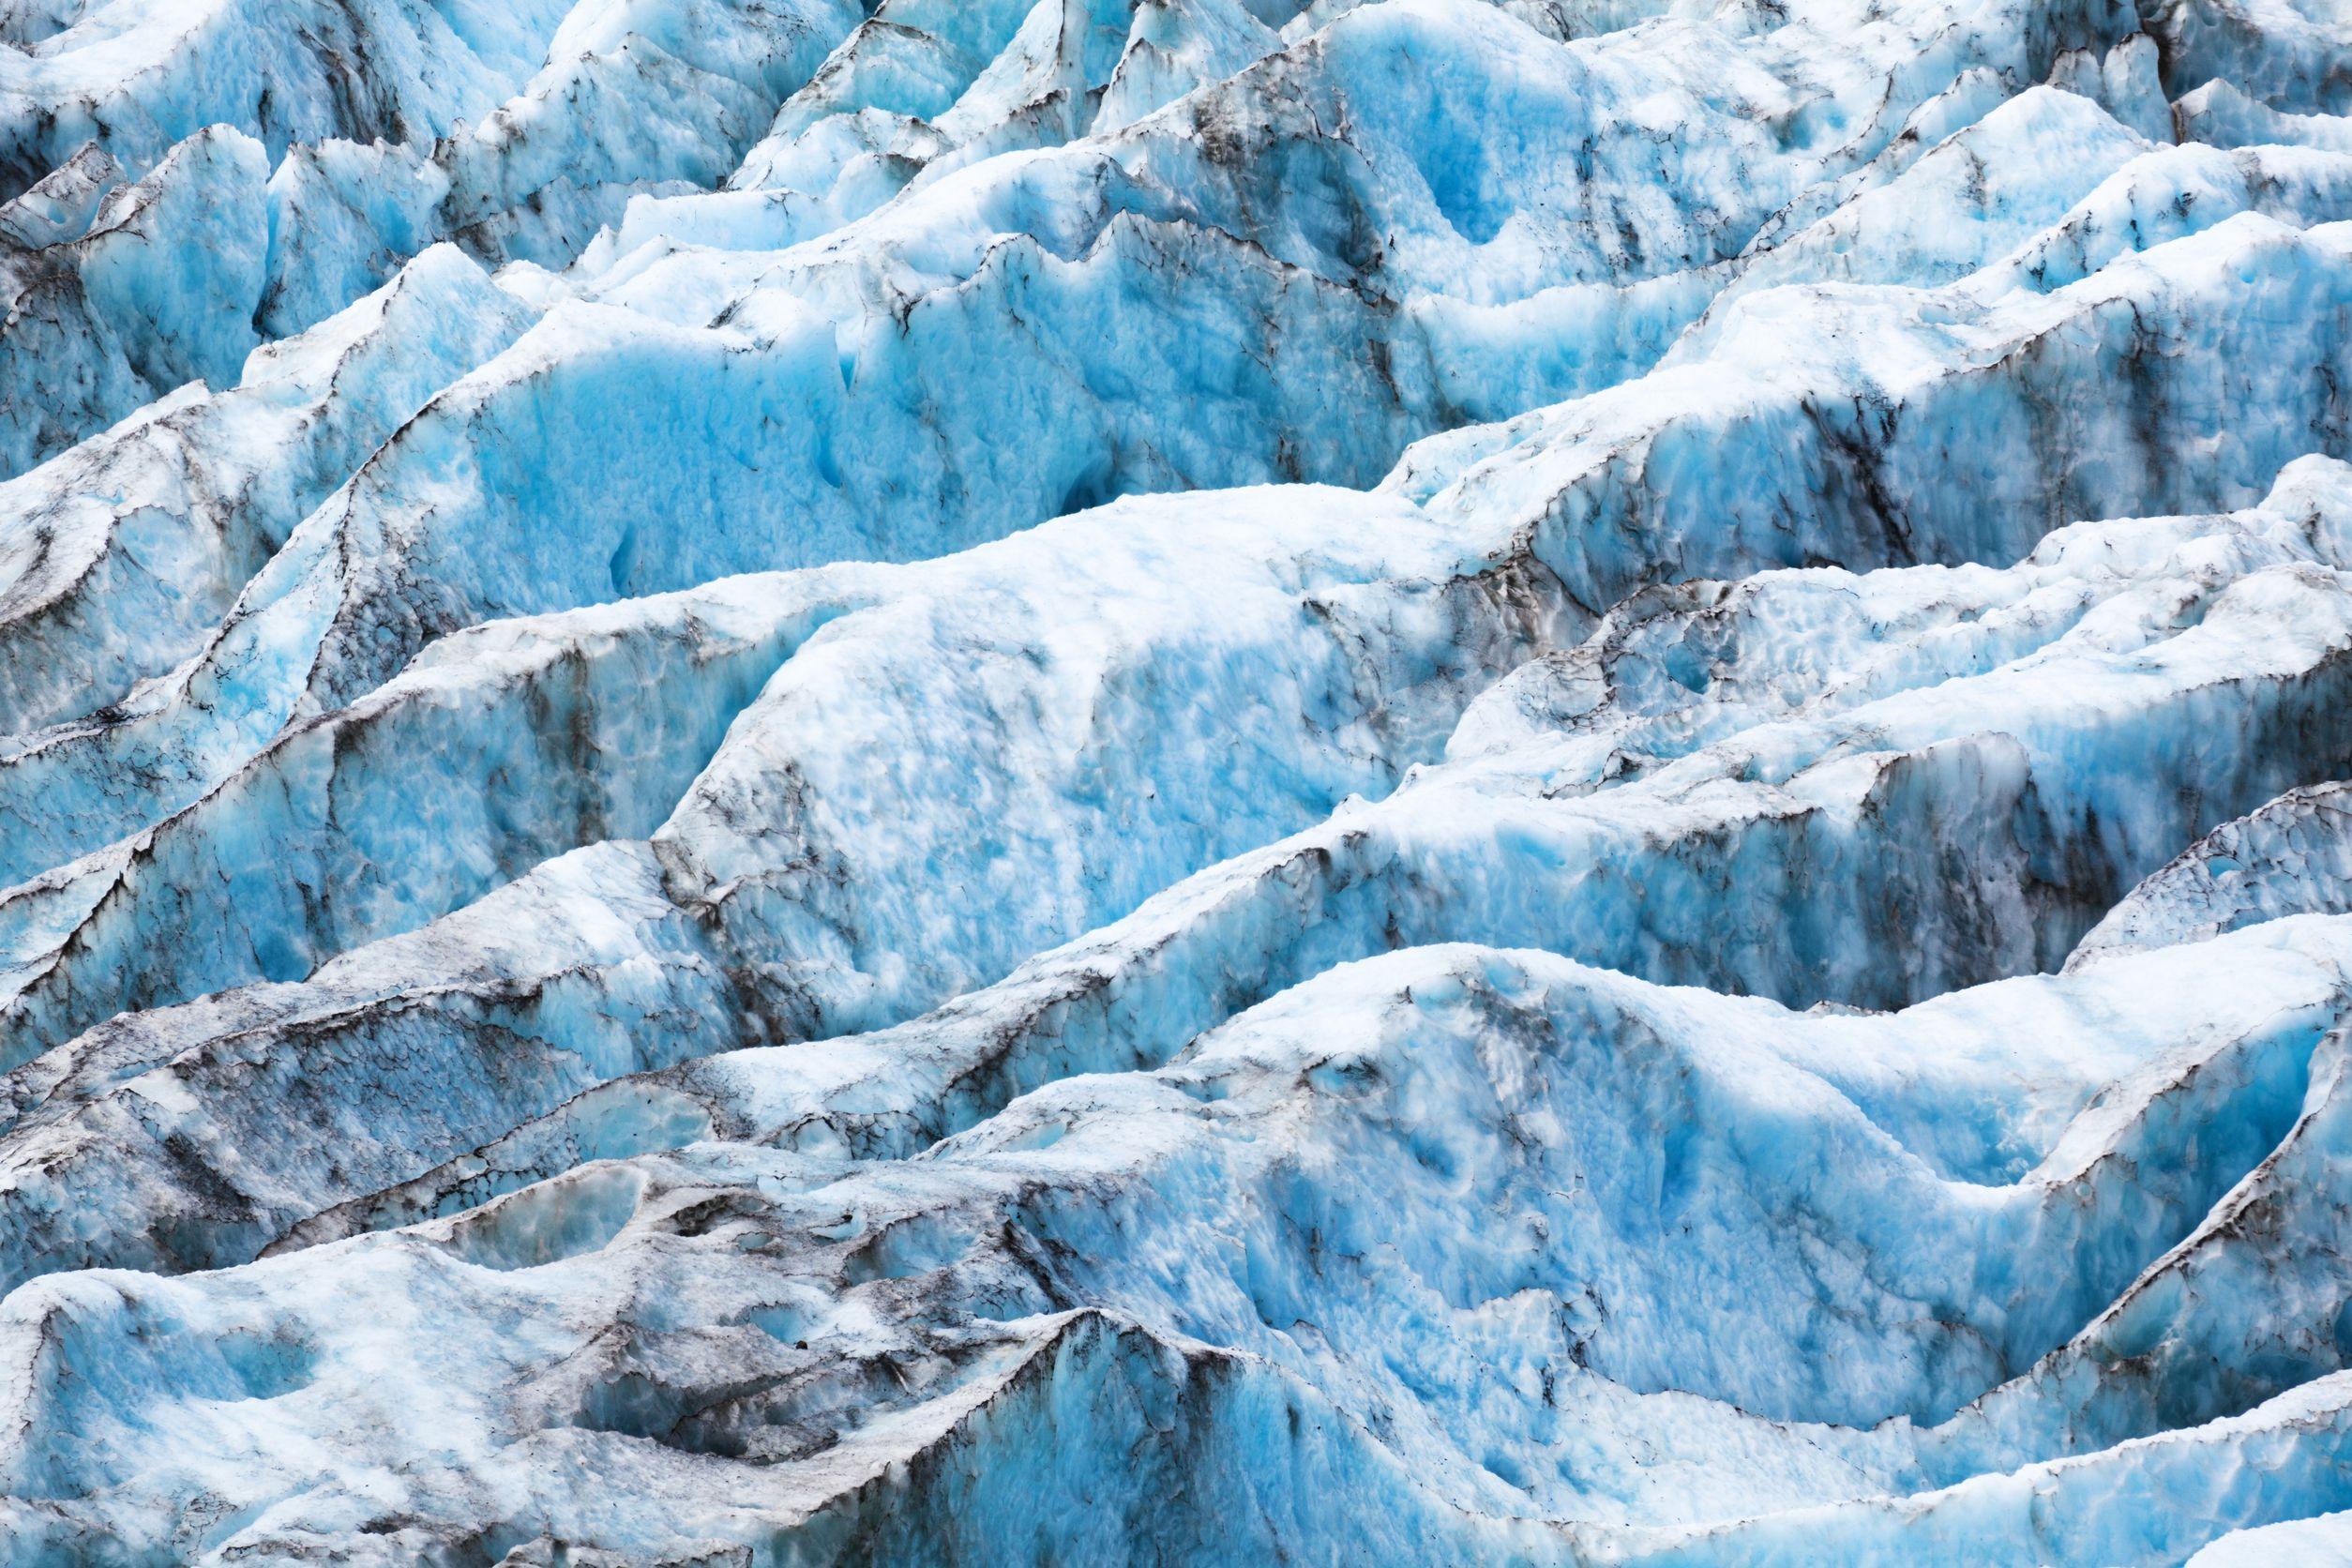 glacial-ice-new-zealand